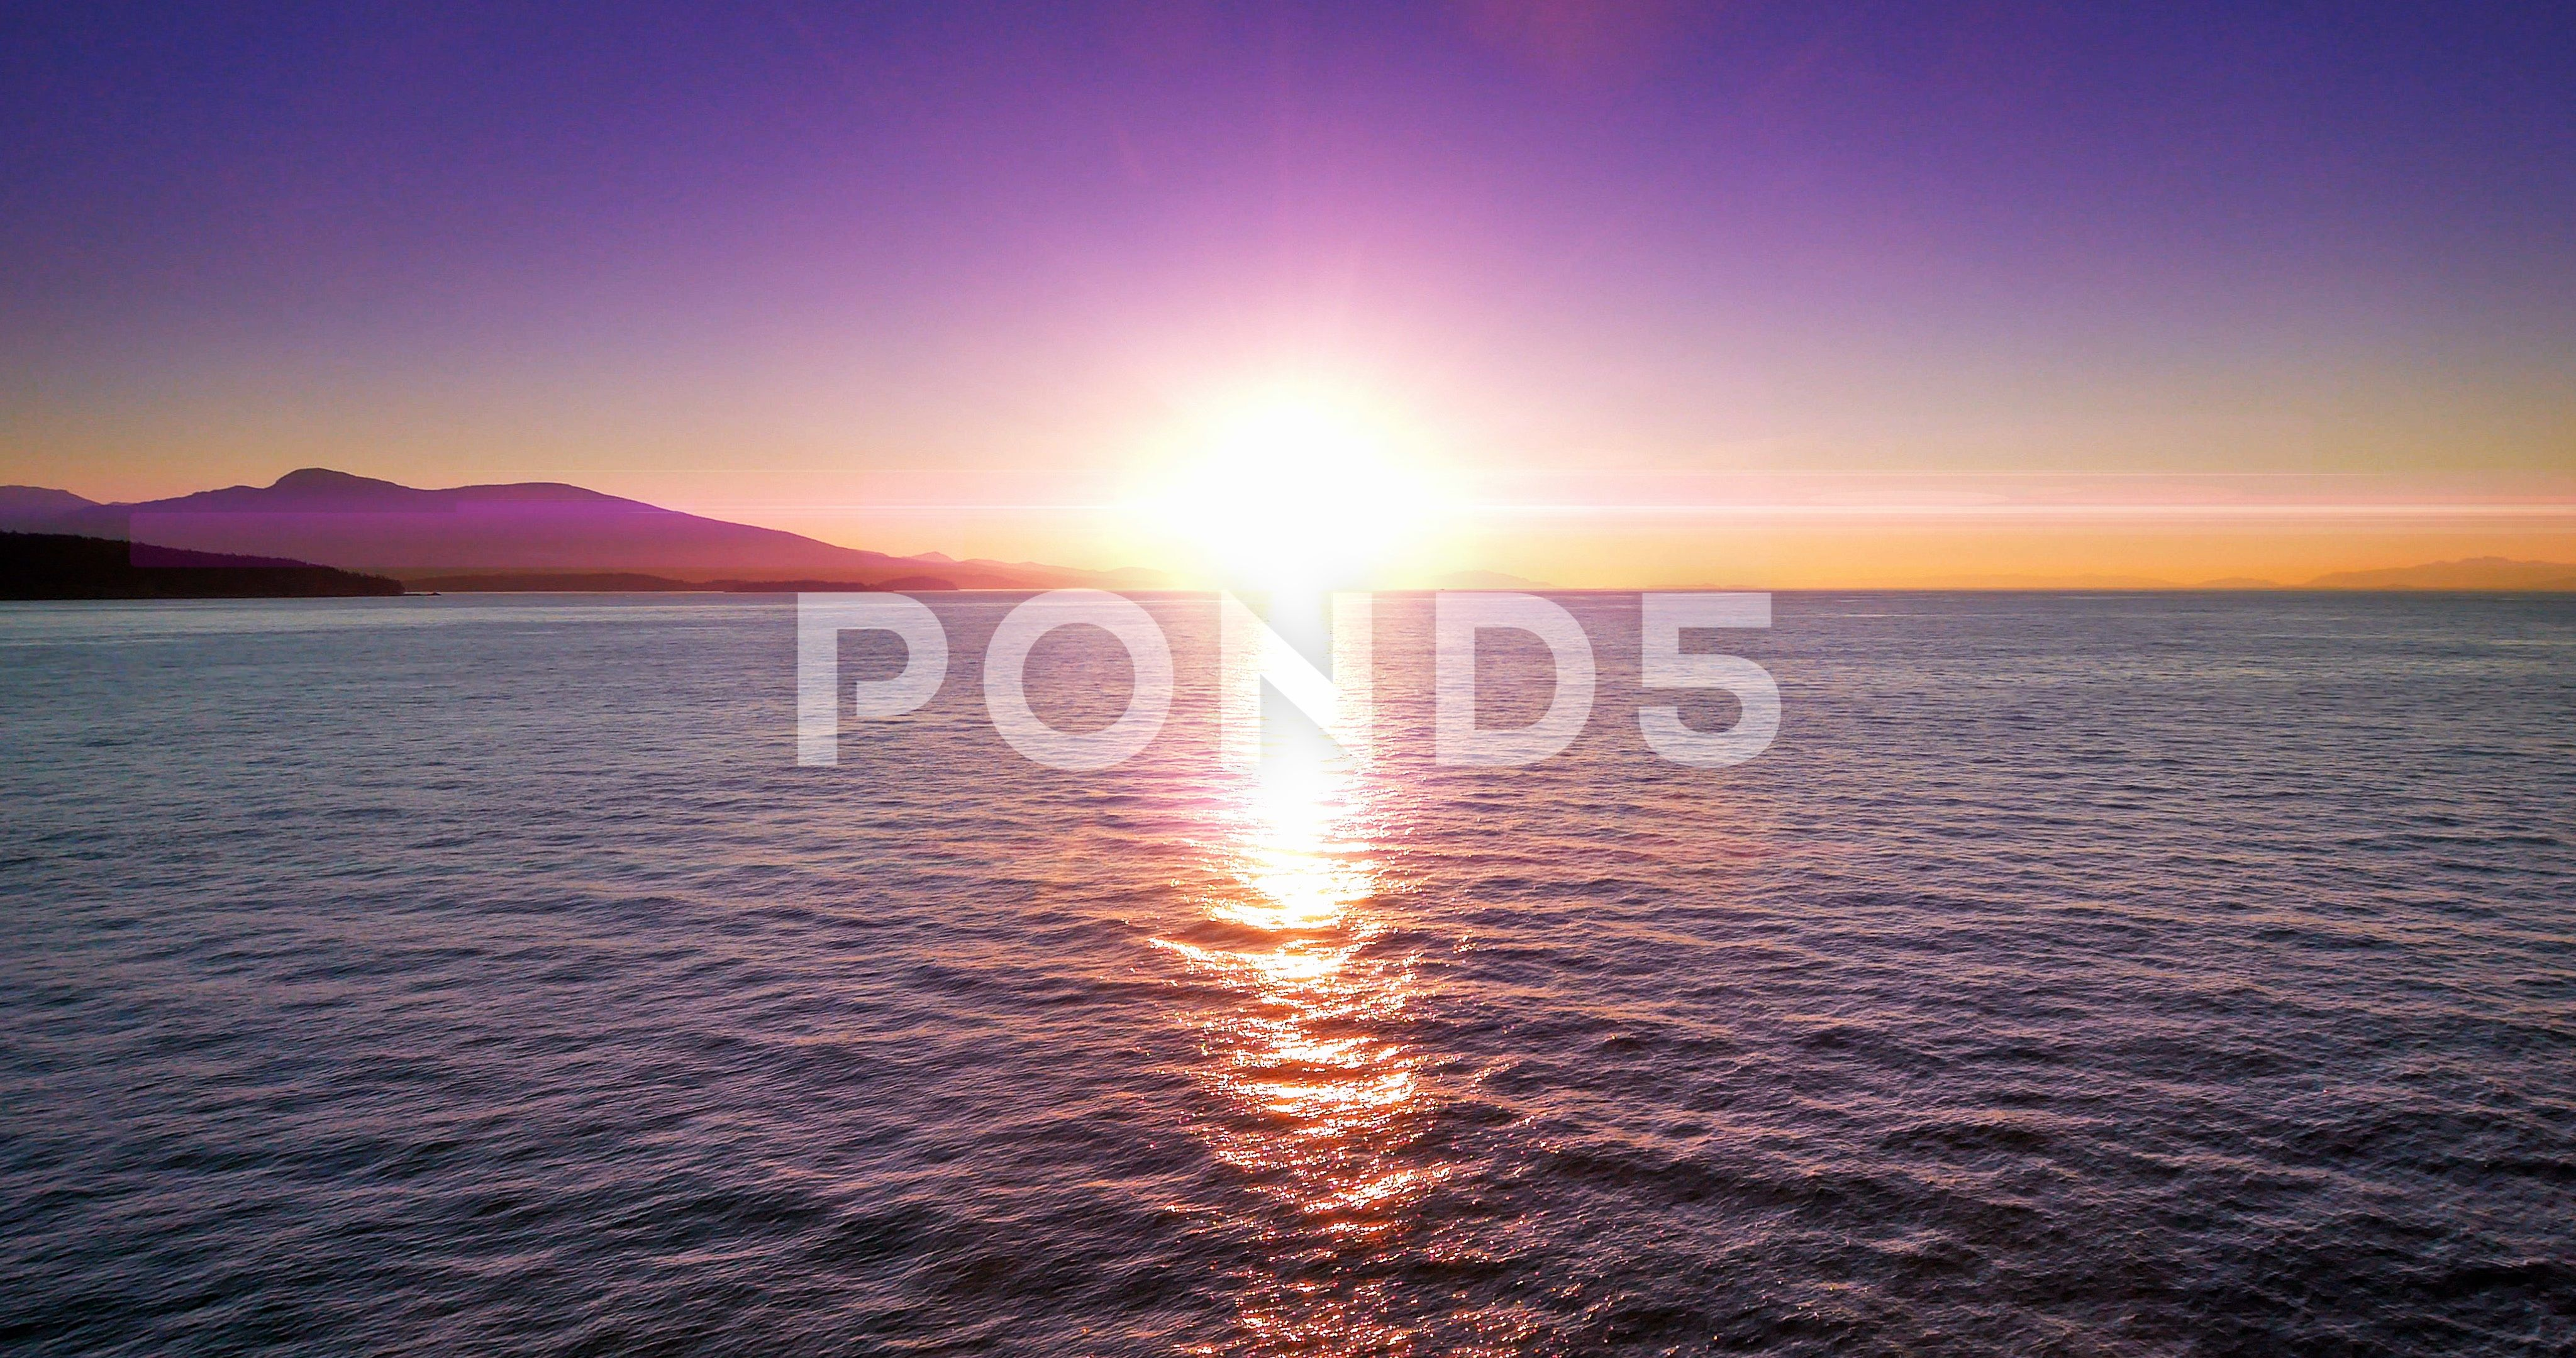 4k Ocean Landscape Scarlet Purple And Pink Orange Sunset Horizon Sunlight Flare Stock Footage Purple Pink Orange Ocean Sunset Landscape